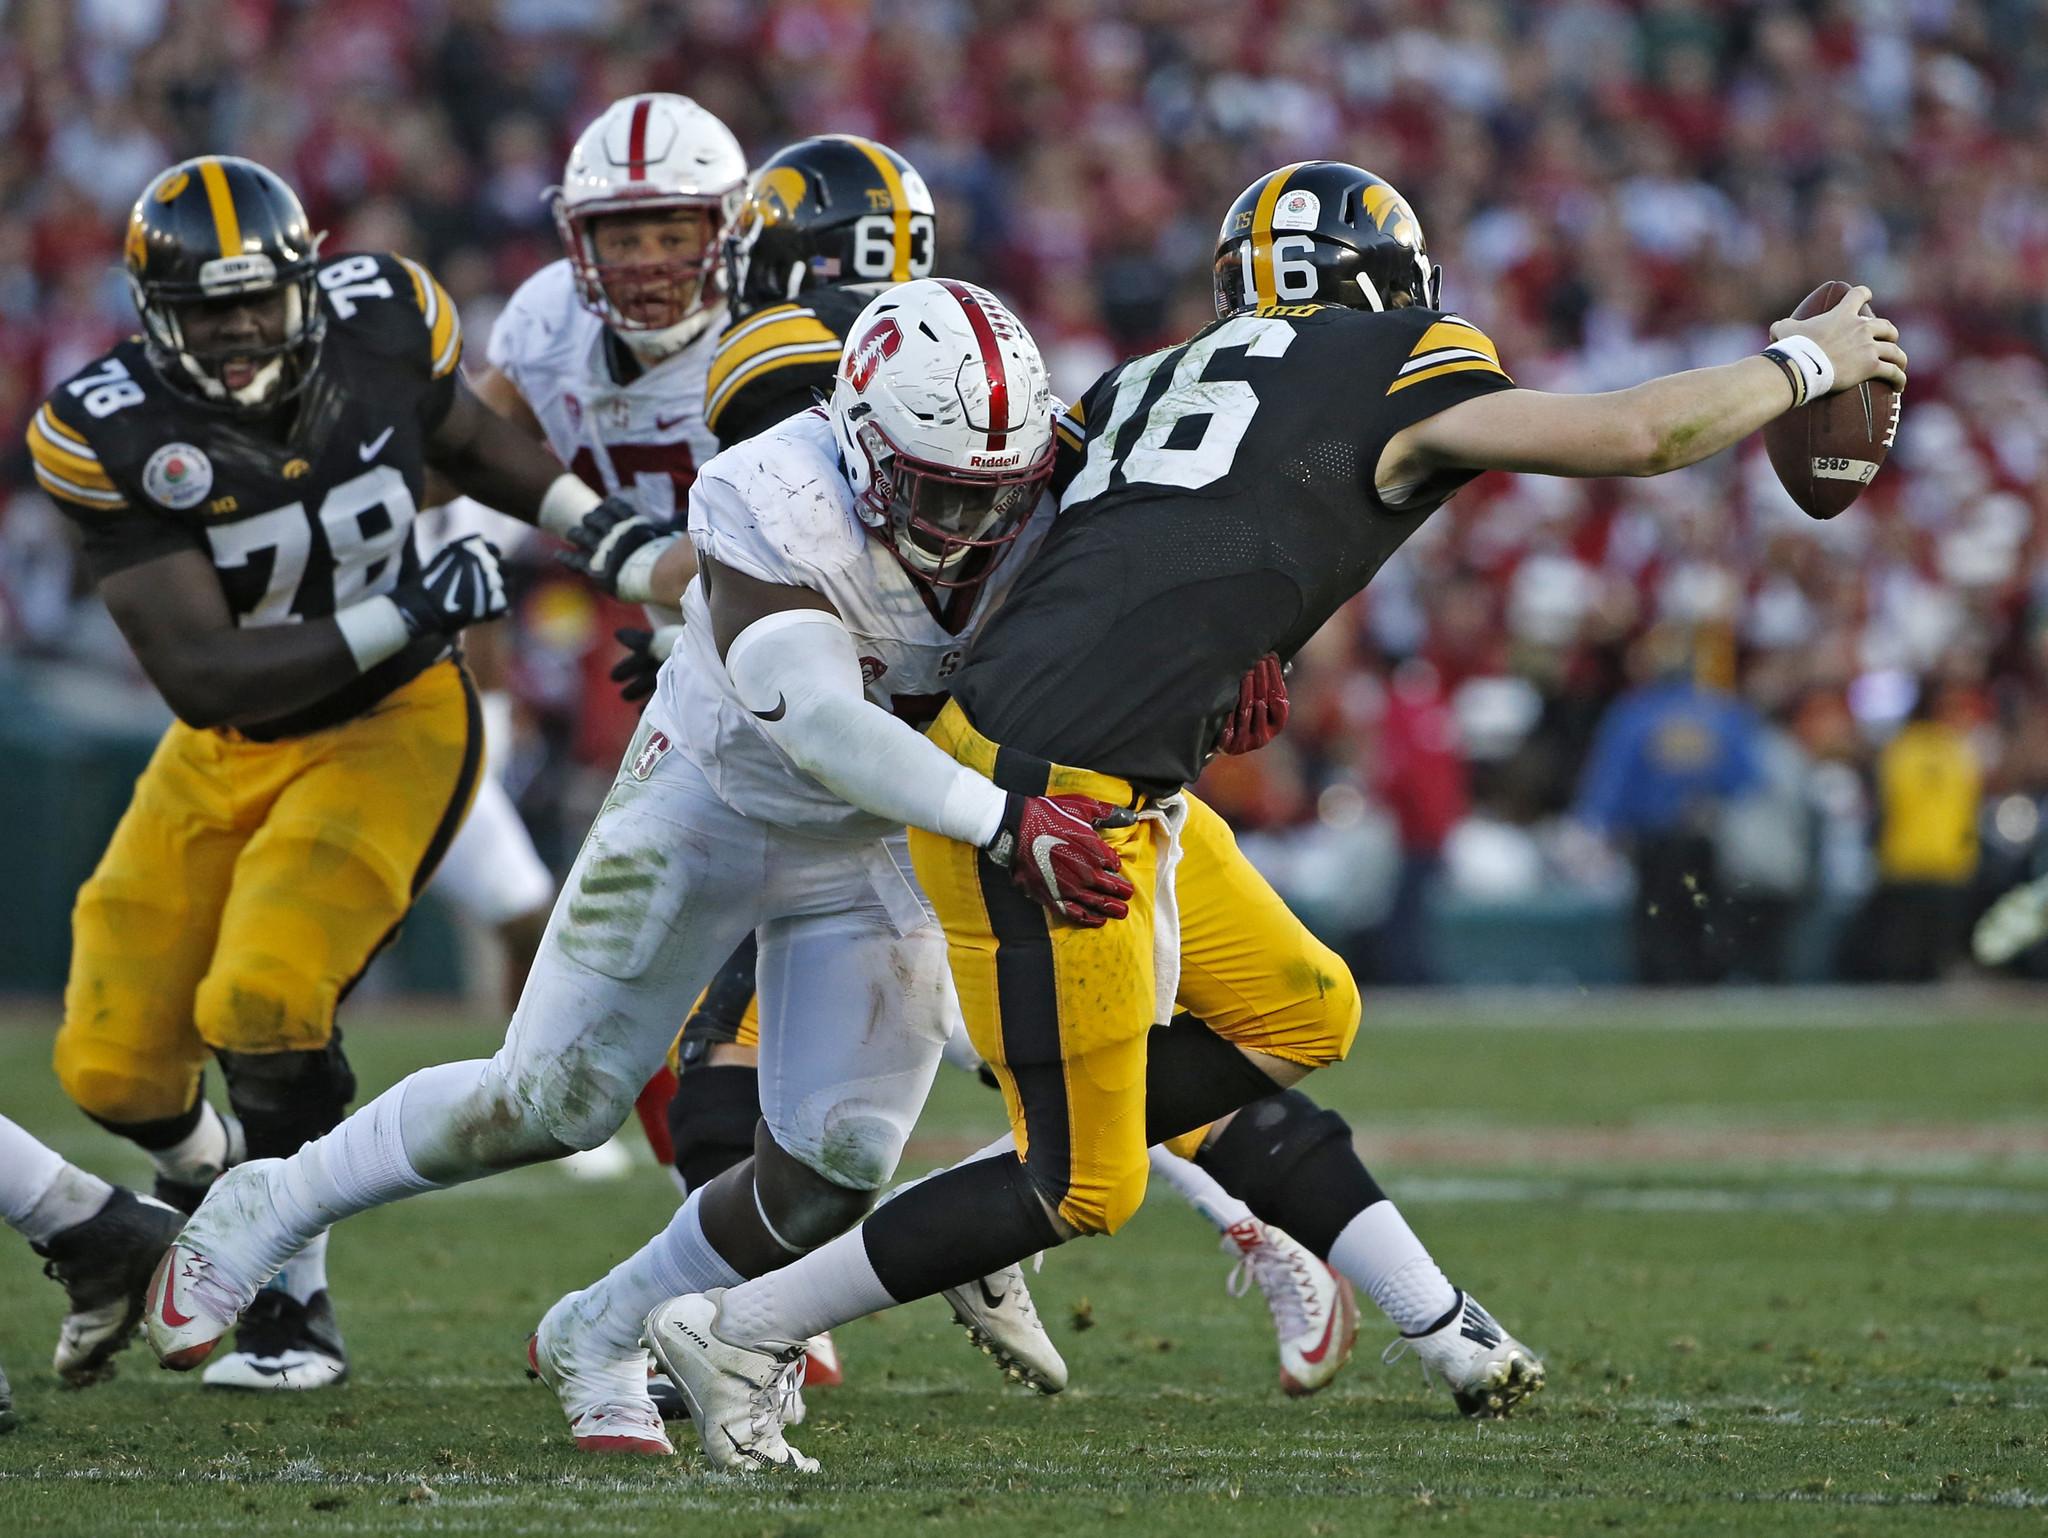 C.J. Beathard is sacked by Stanford defensive end Aziz Shittu. (Lenny Ignelzi / AP Photo)